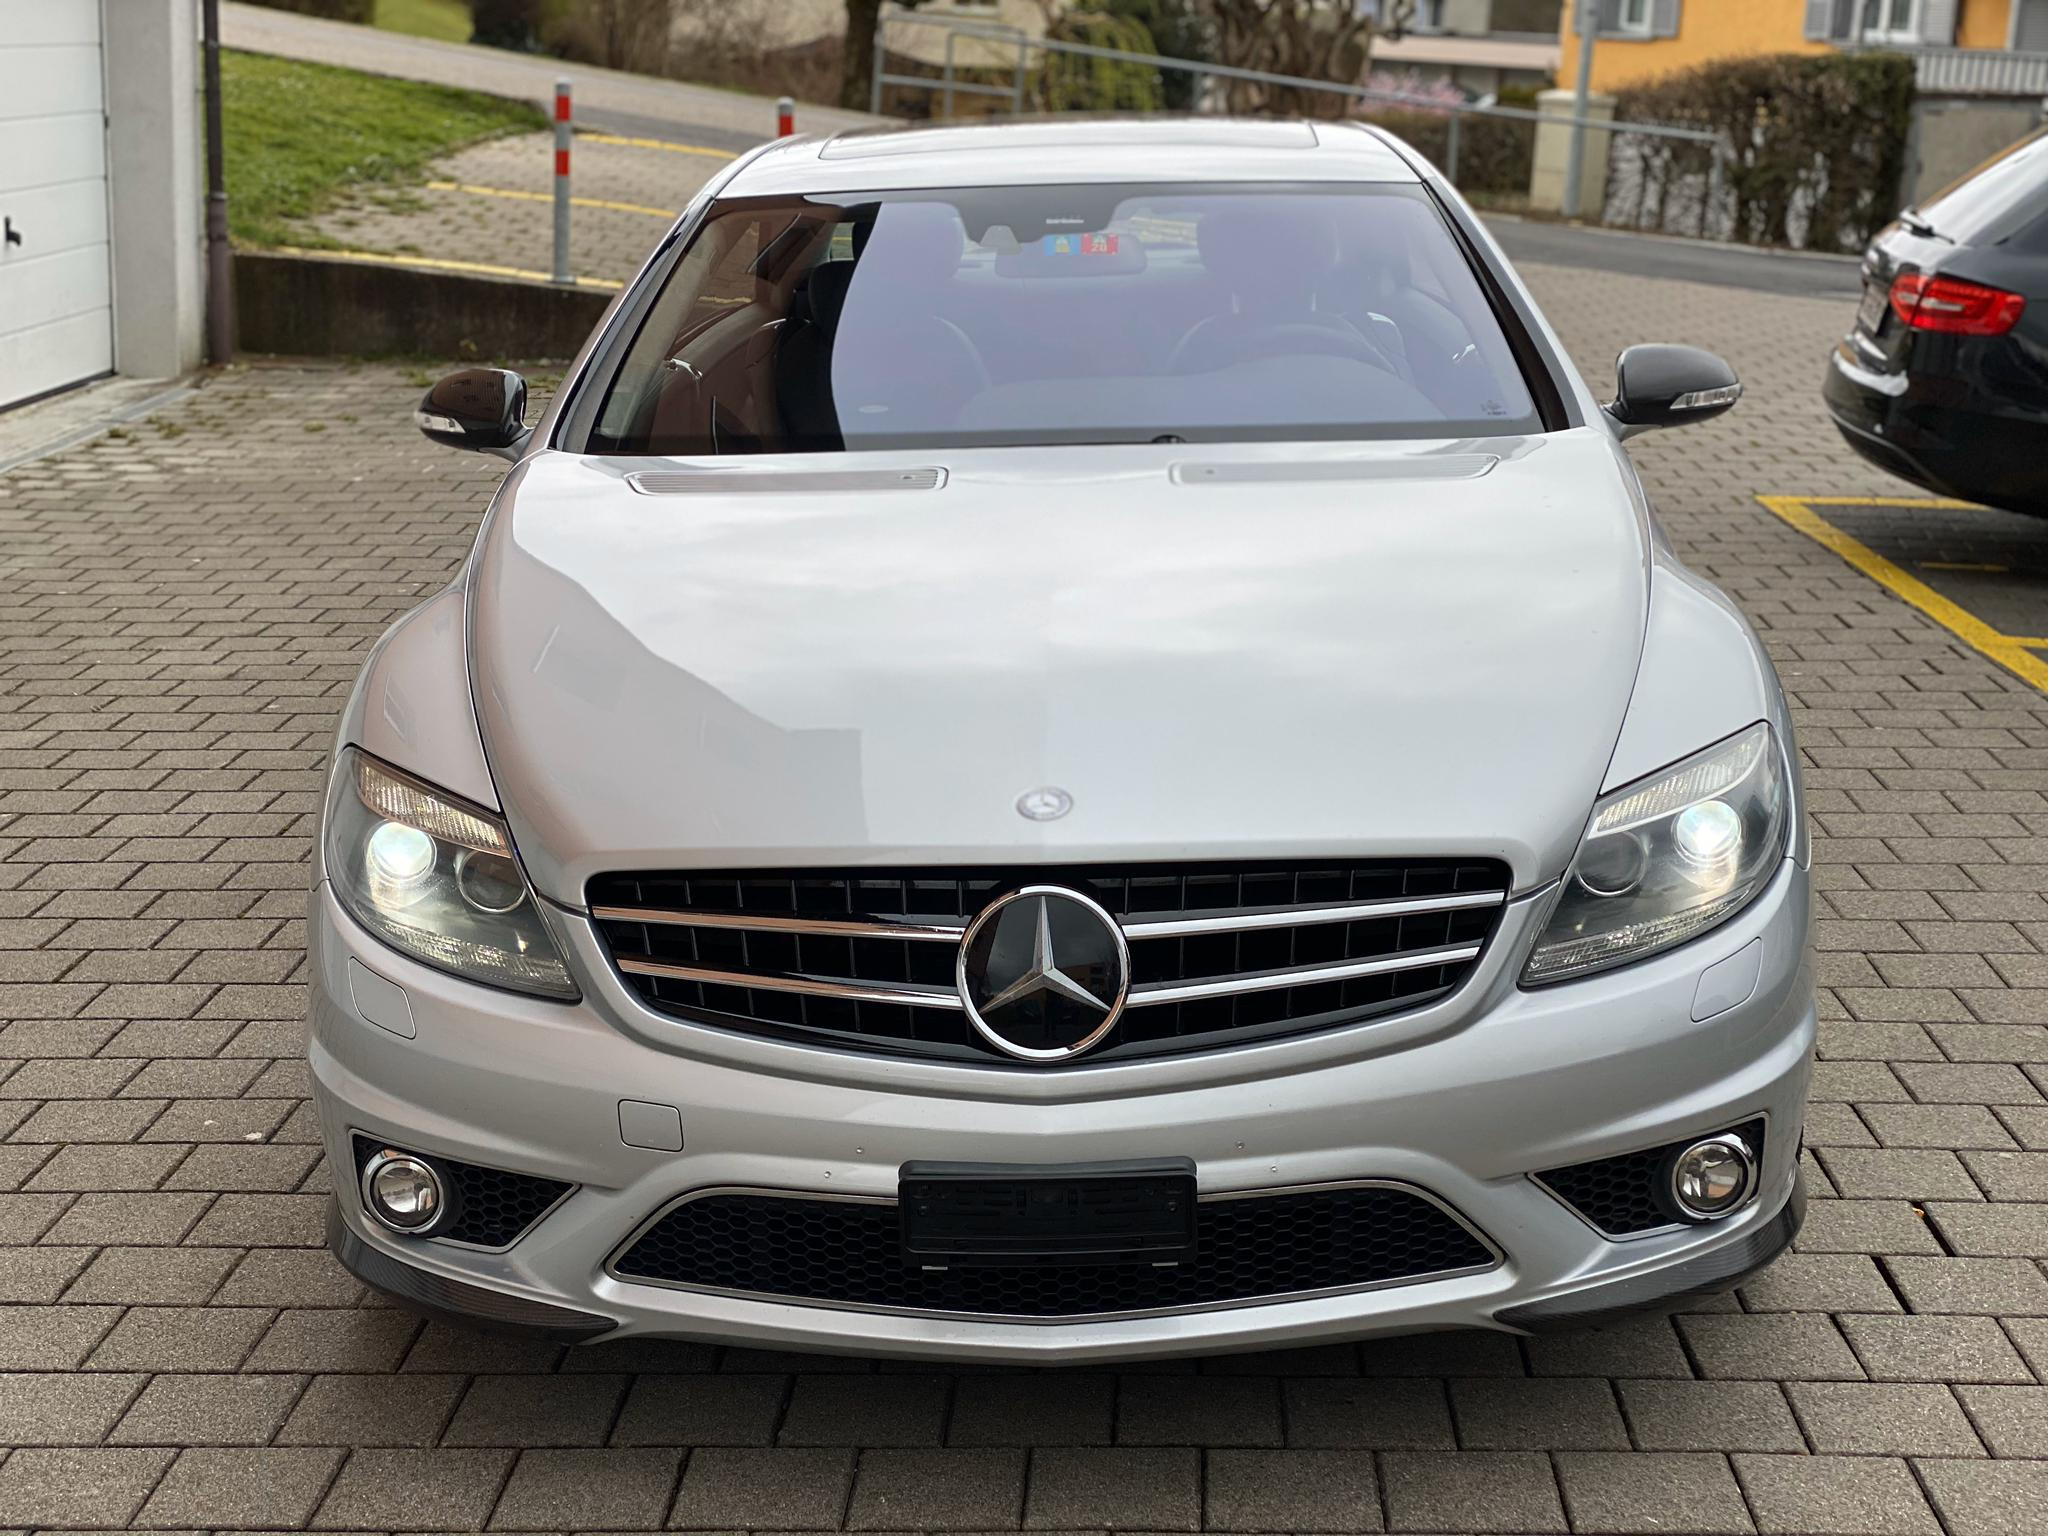 coupe Mercedes-Benz CL 63 AMG Coupé